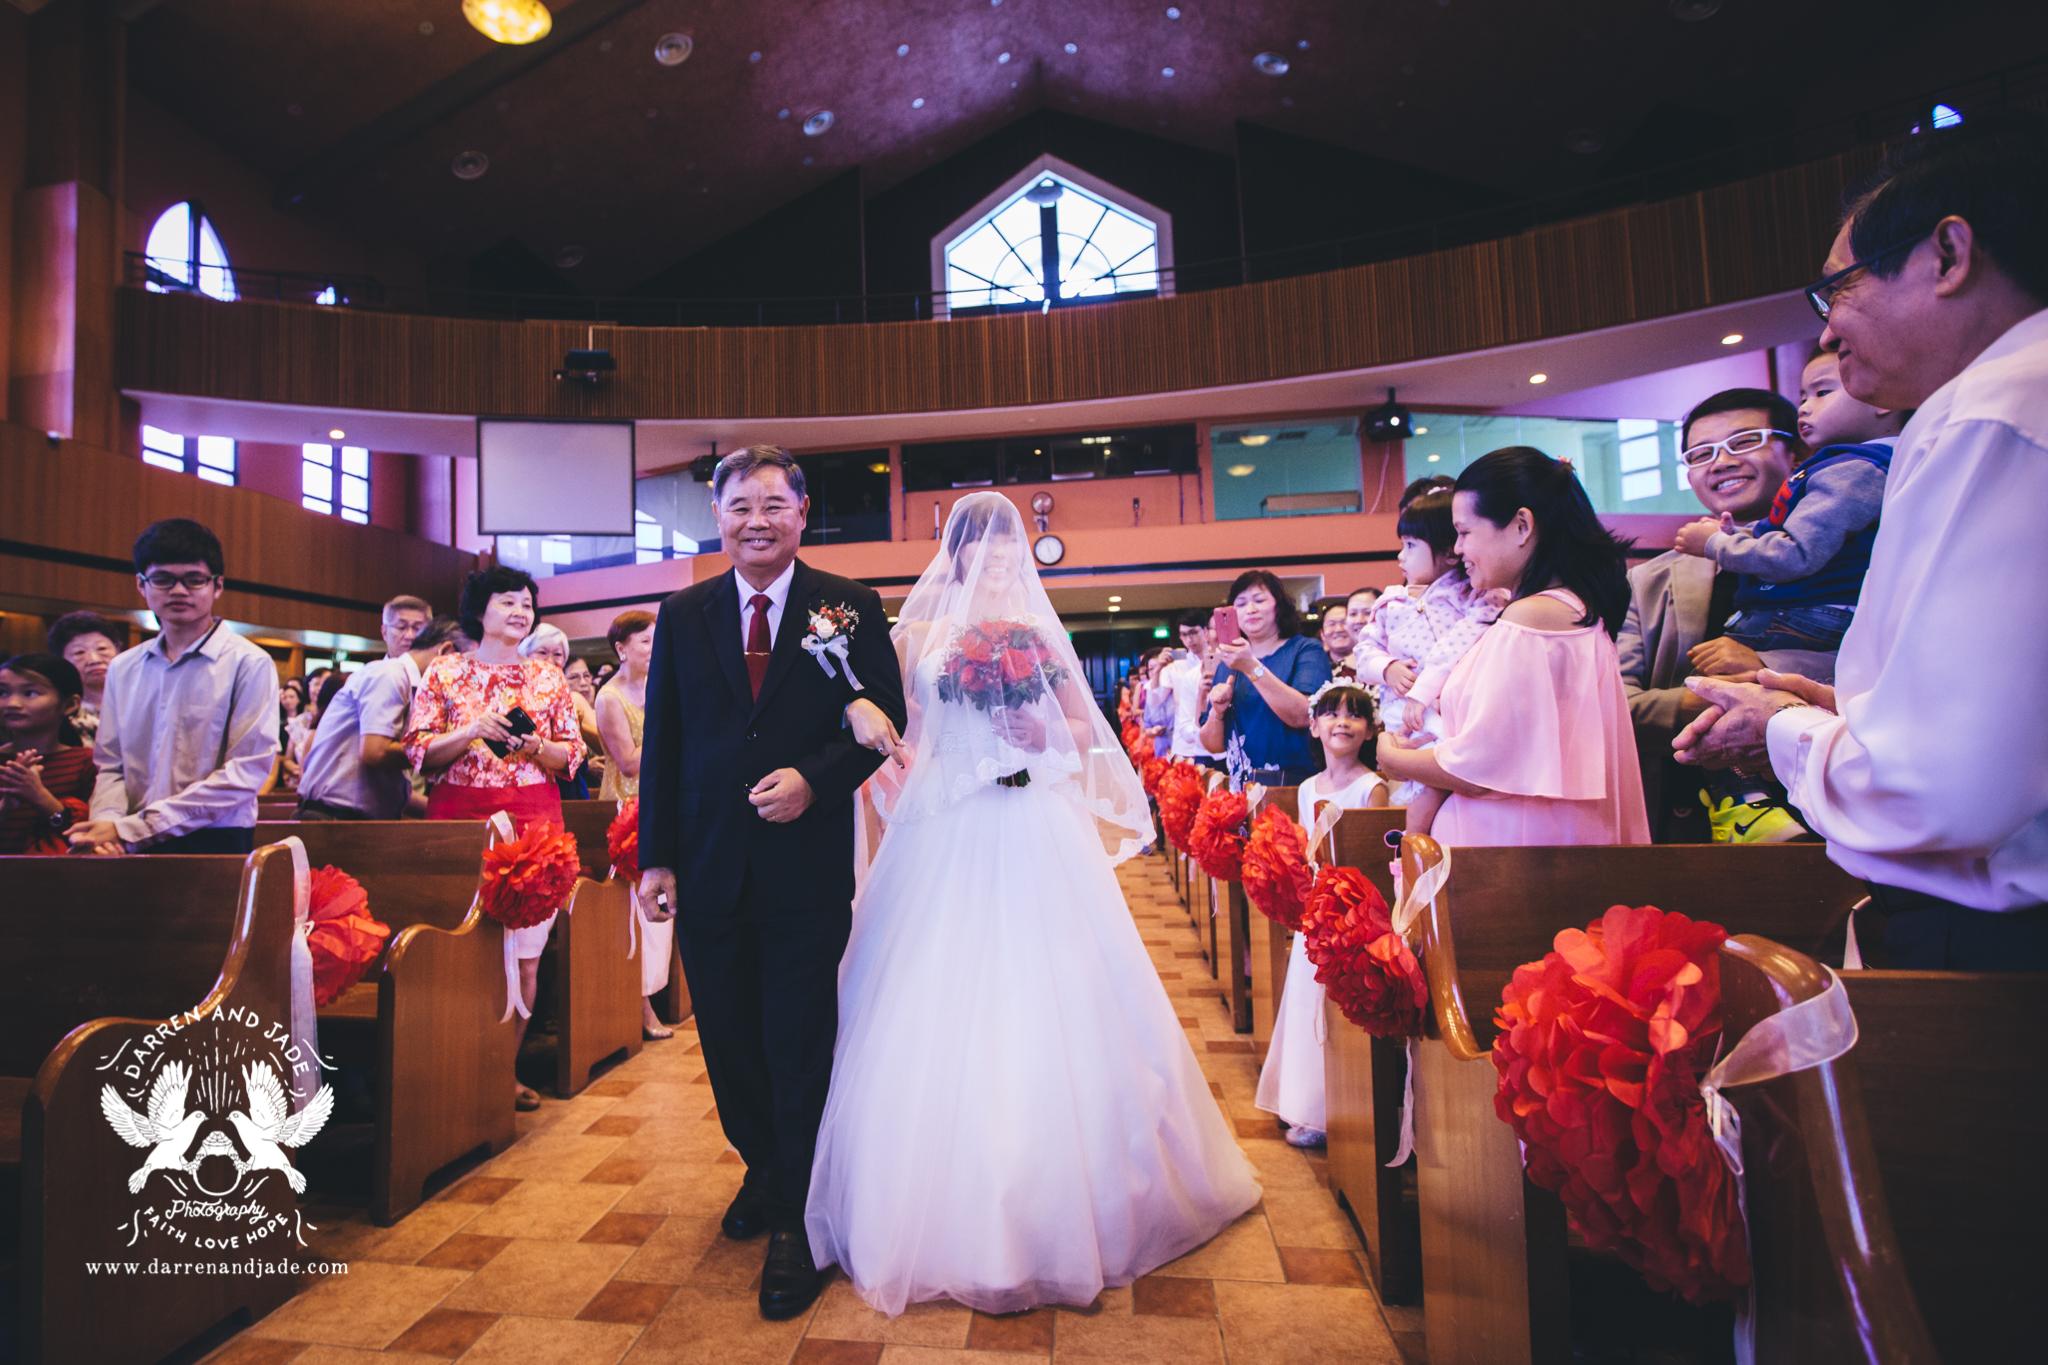 Bel & Emans - Wedding - Blog (37 of 69).jpg